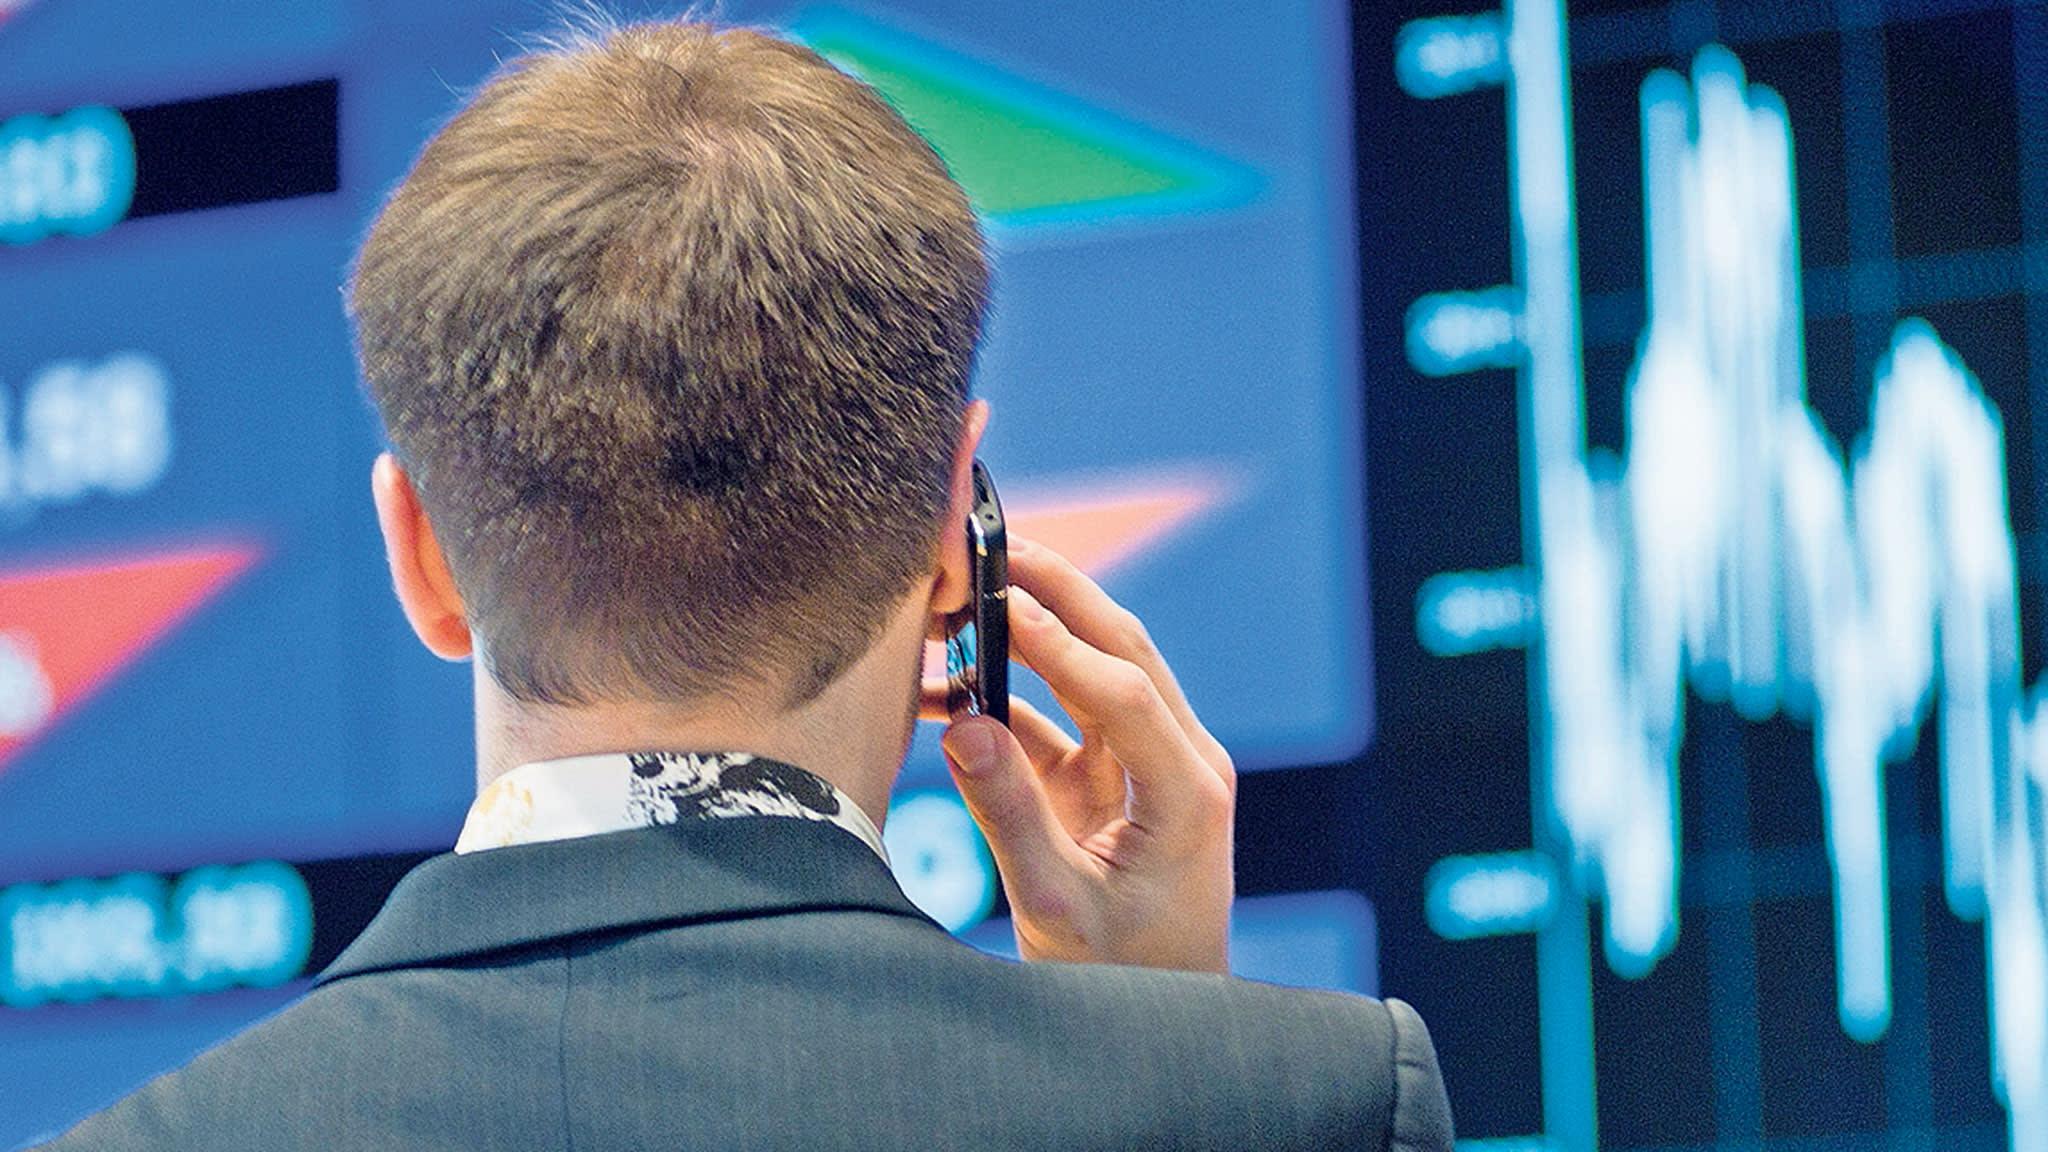 Poland's banks turn high tech   Financial Times